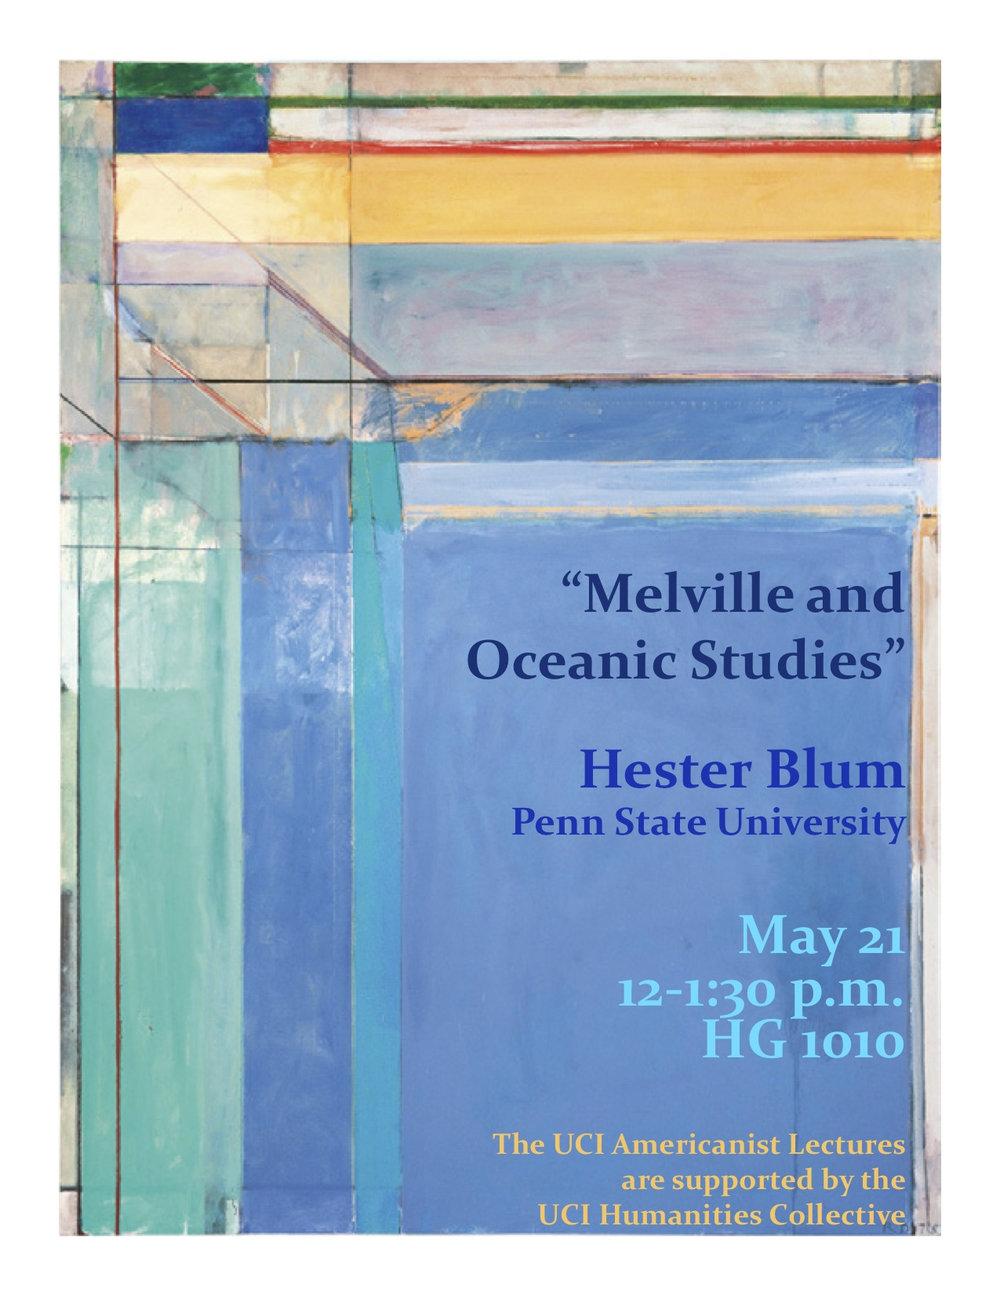 Hester-Blum-Poster-gradient-VI-A-Lec.jpg